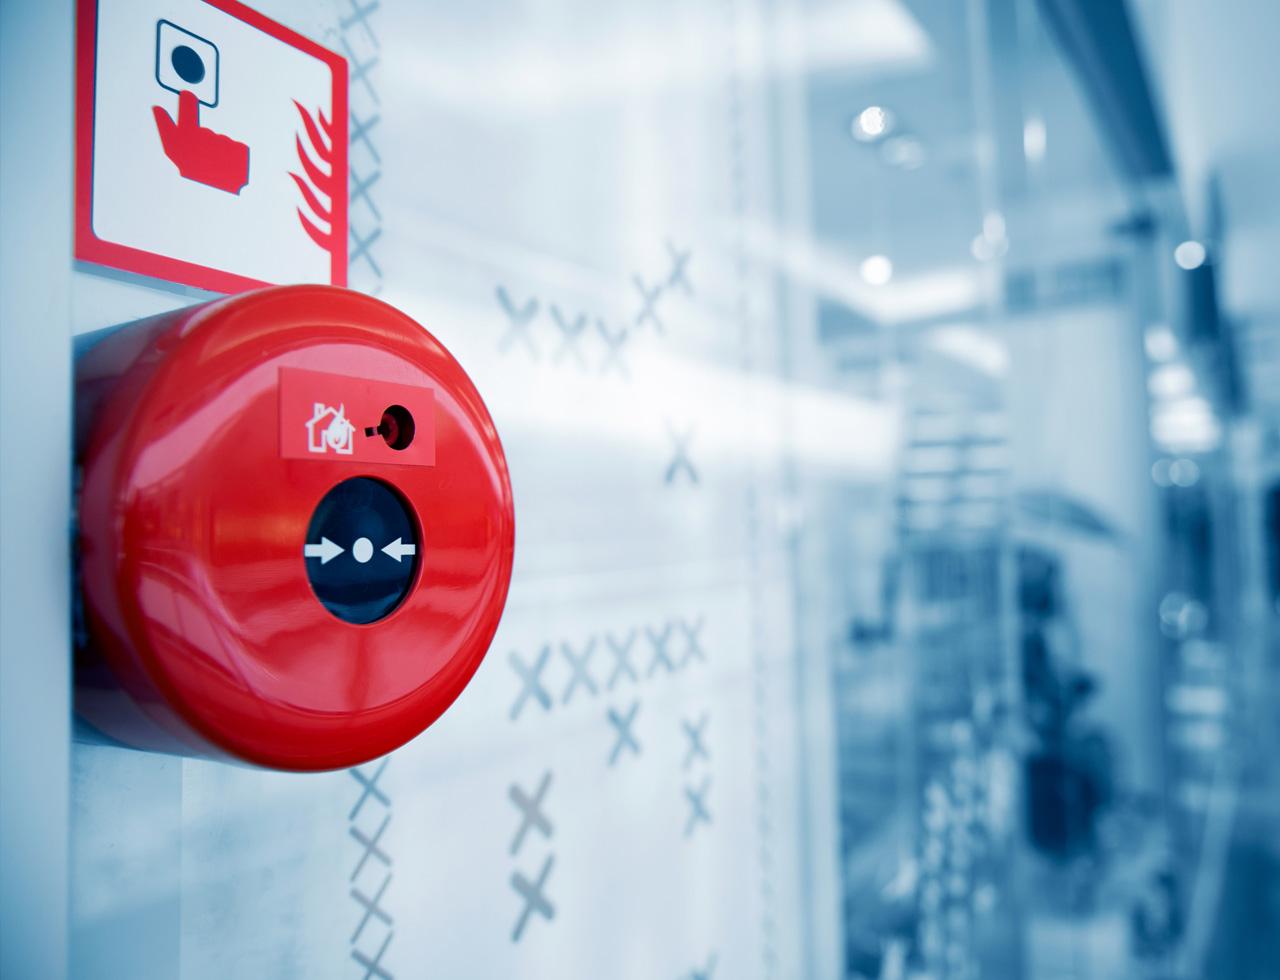 fire-alarms-2